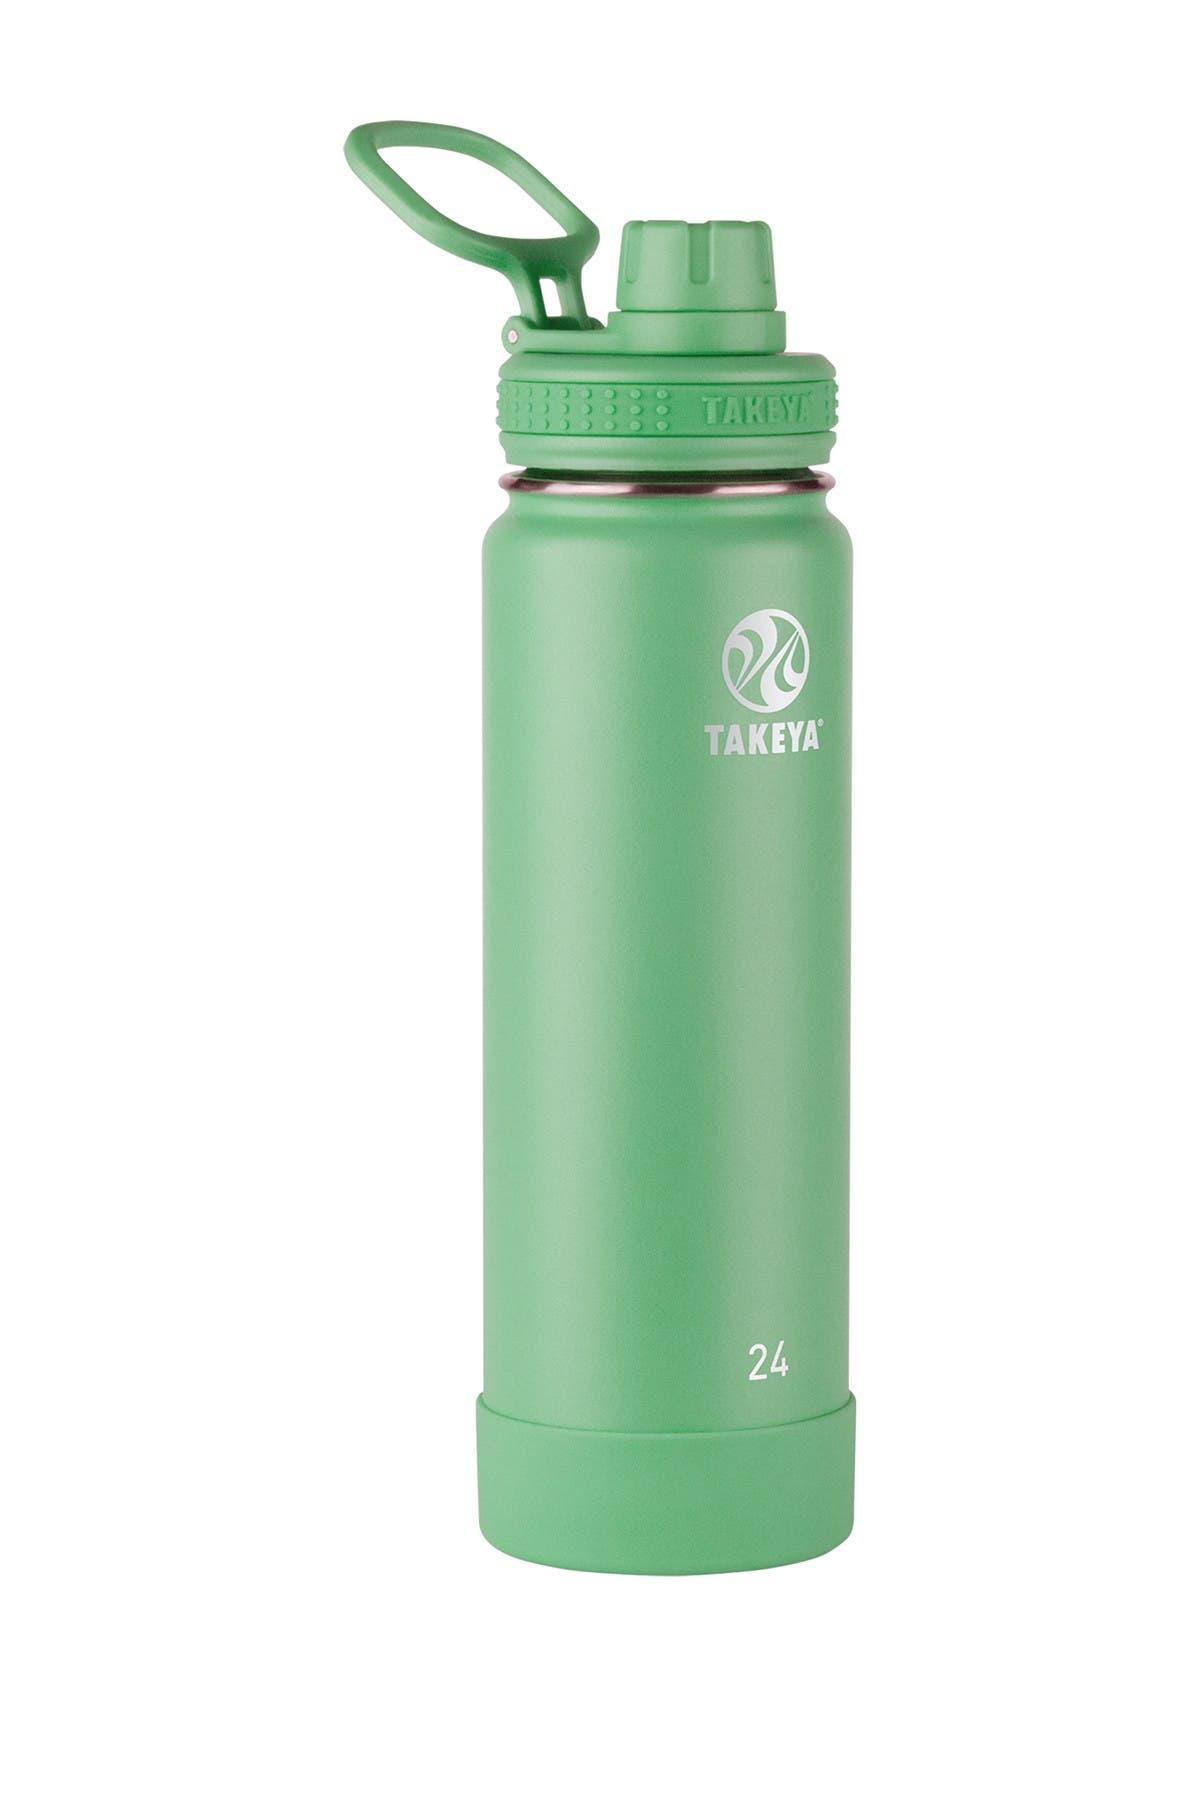 Image of Takeya Actives 24 oz. Spout Bottle - Mint